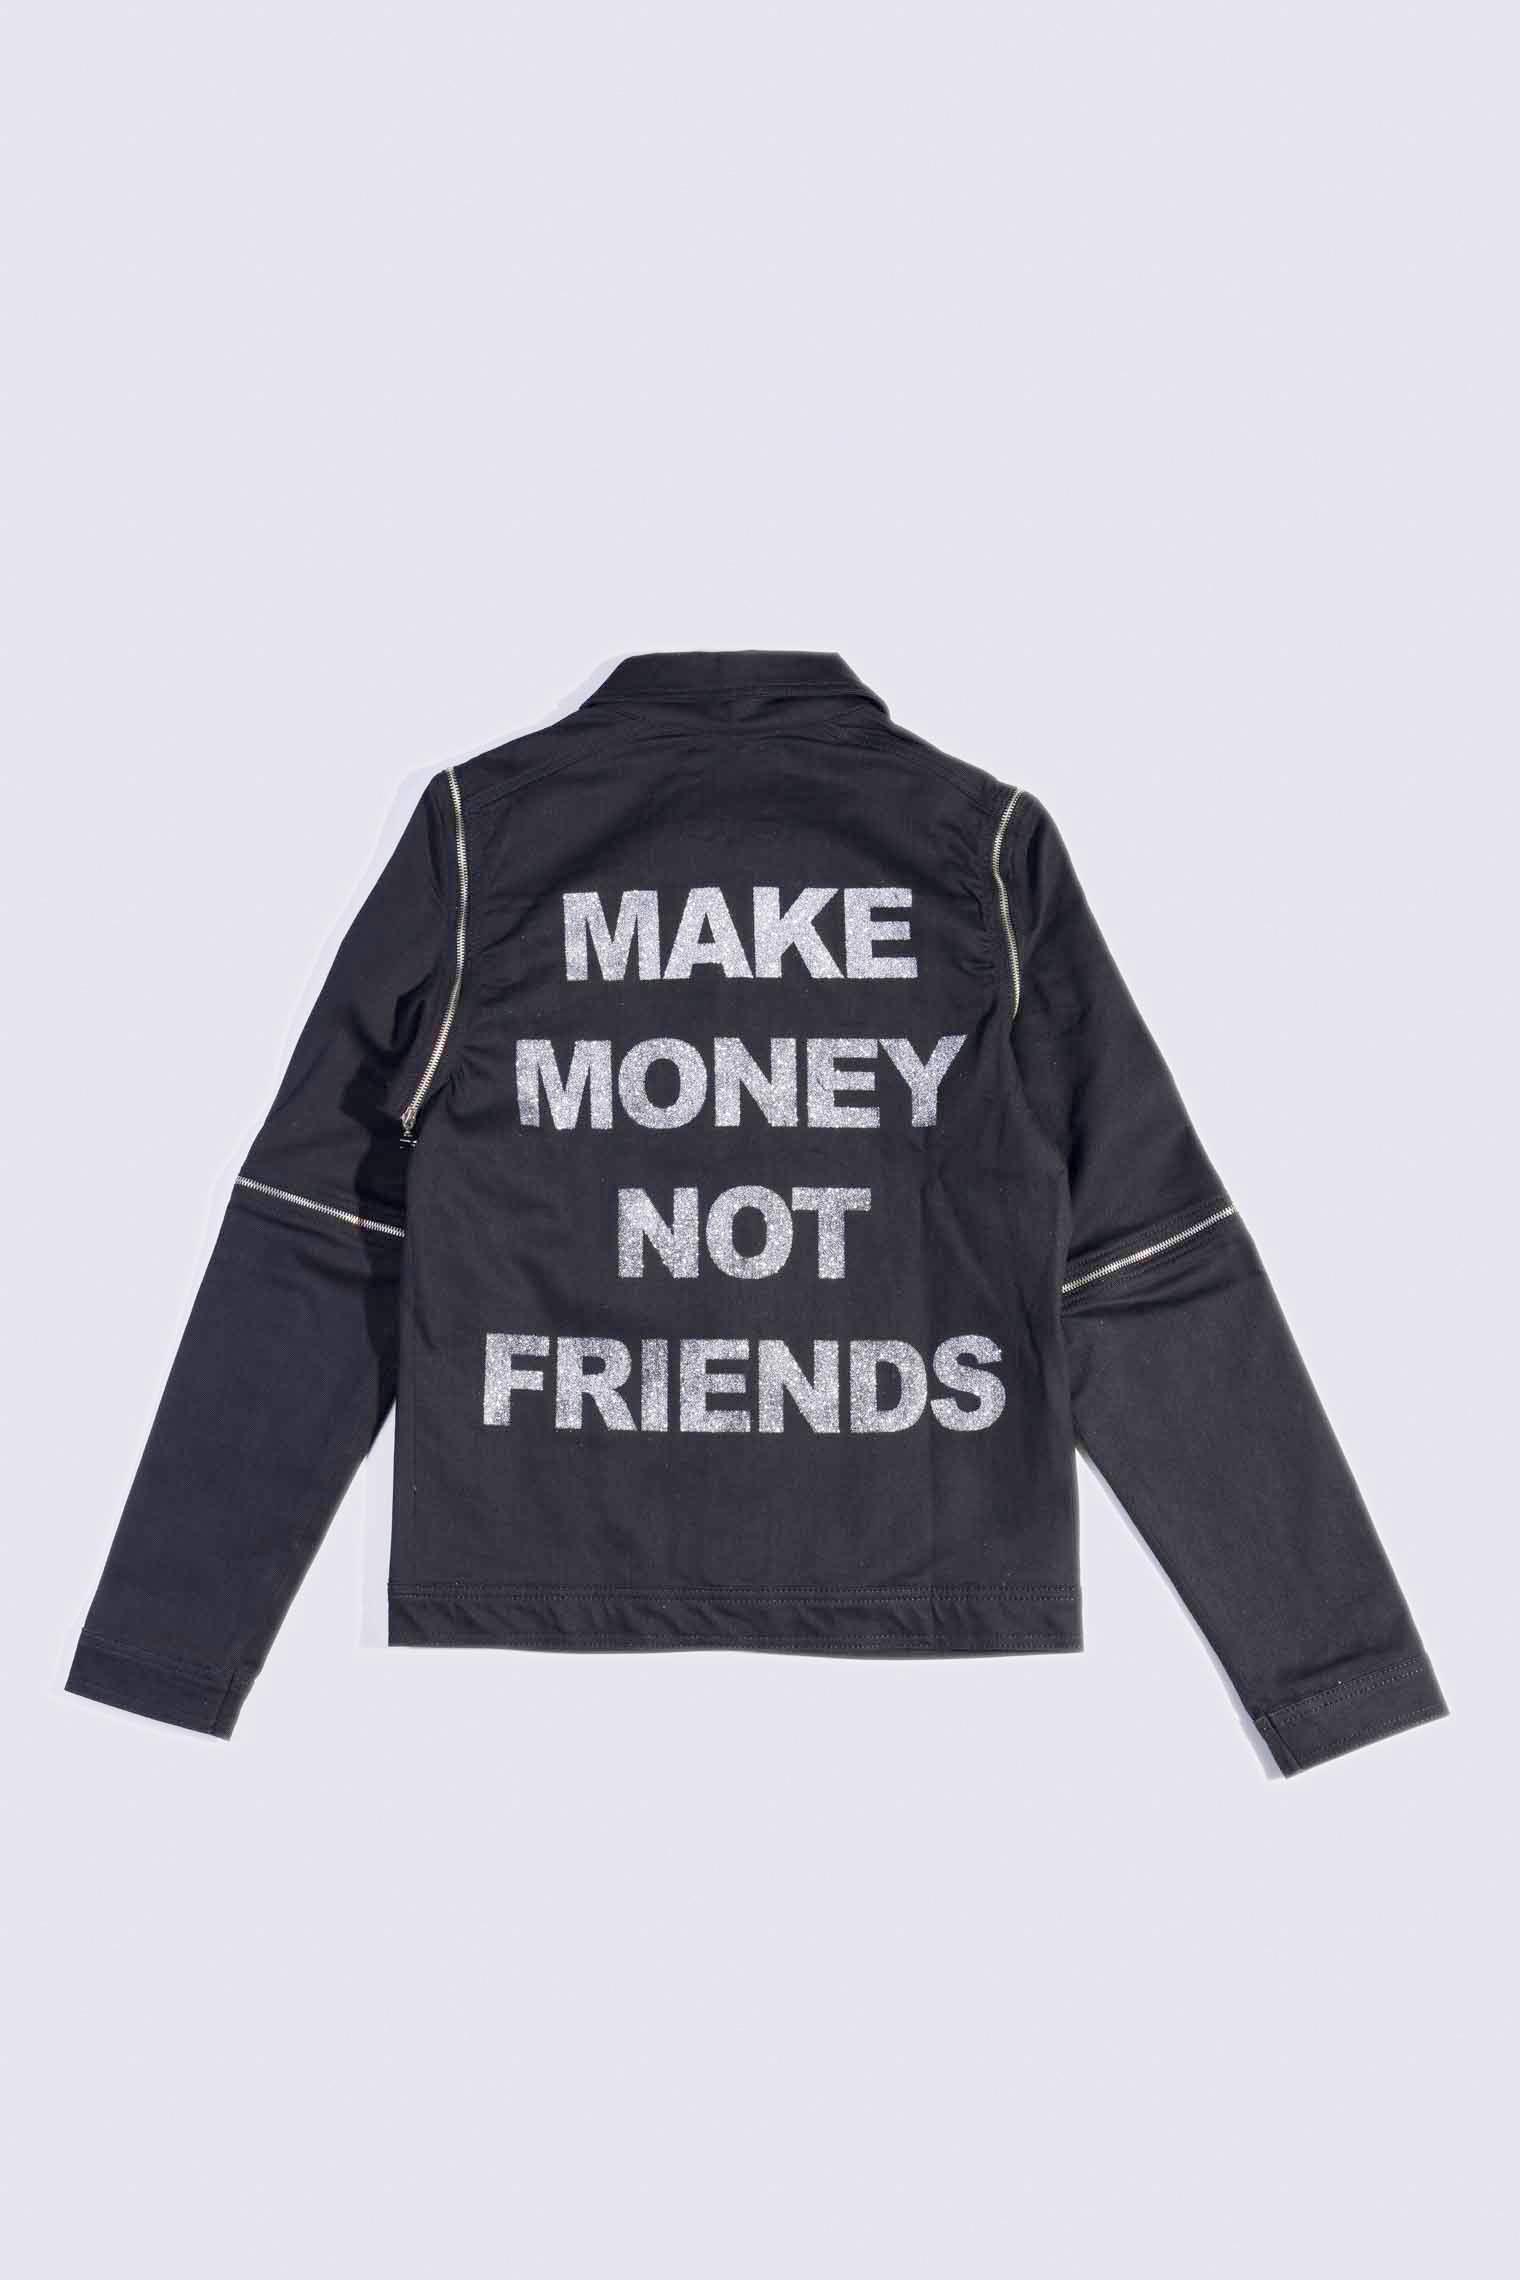 MAKE MONEY NOT FRIENDS GIUBBINO ZIP NERO/ARGENTO AE6